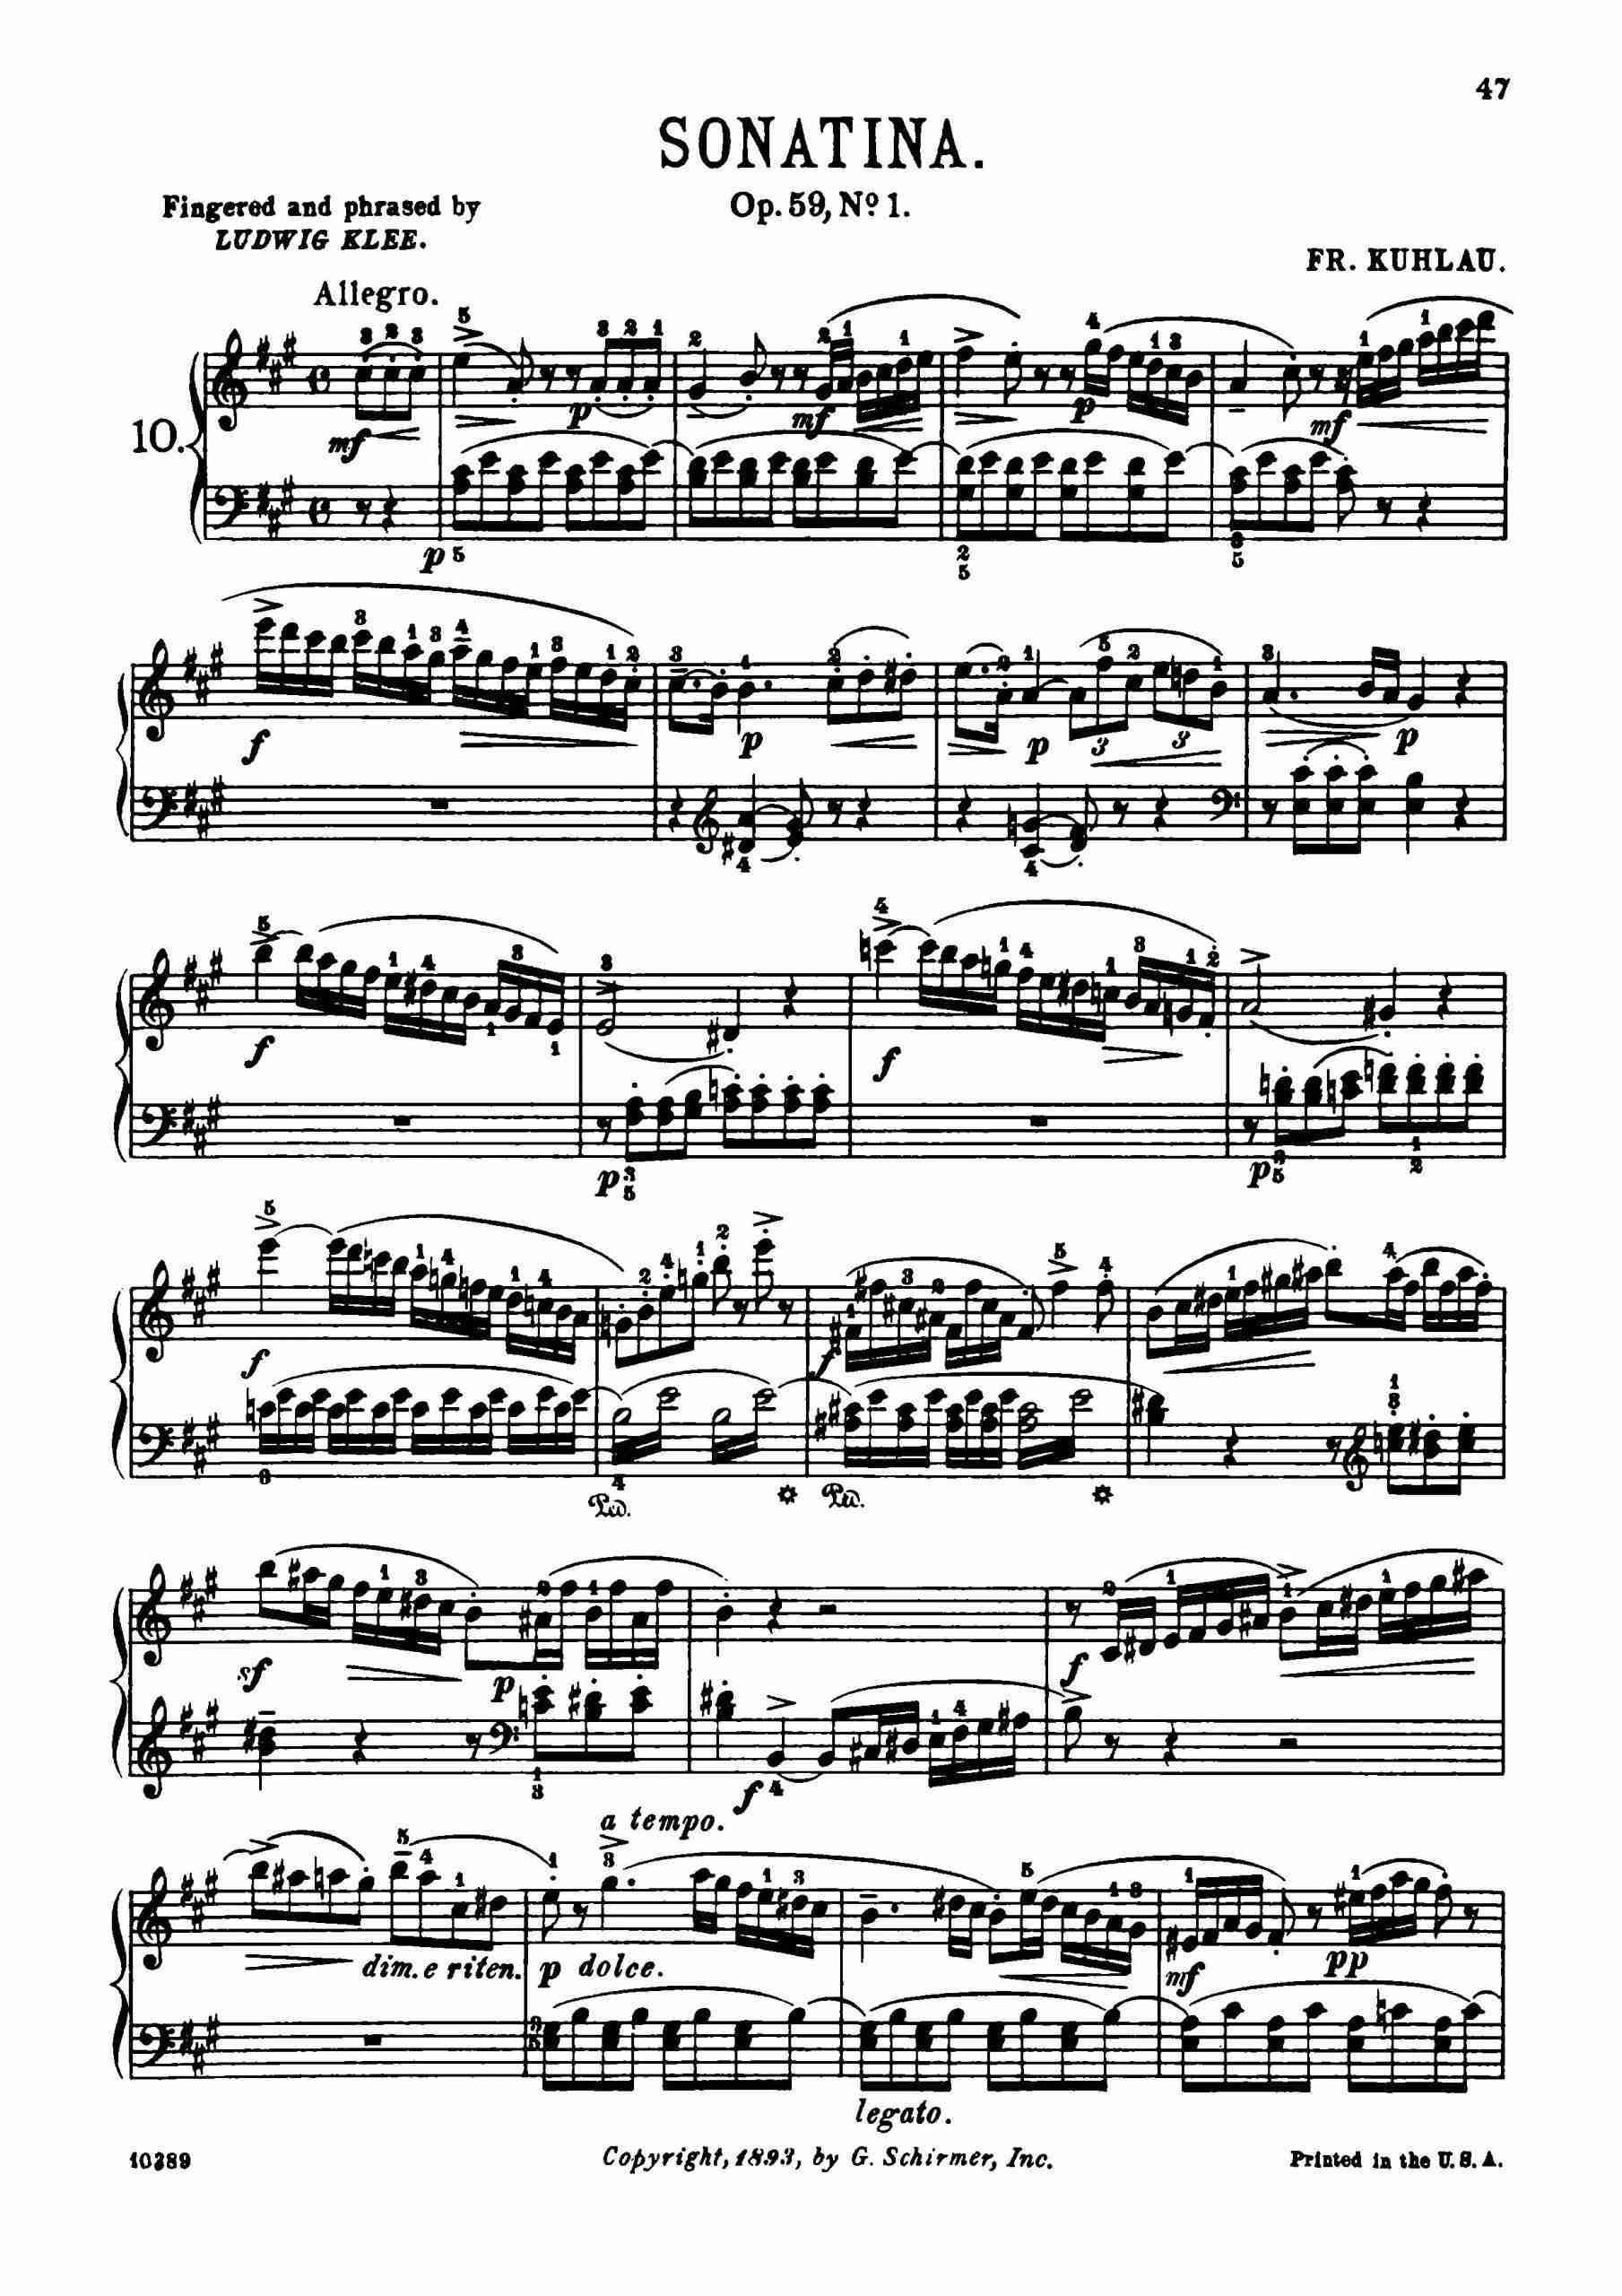 Kuhlau, Friedrich - Piano Sonata in A major, Op.59 No.1